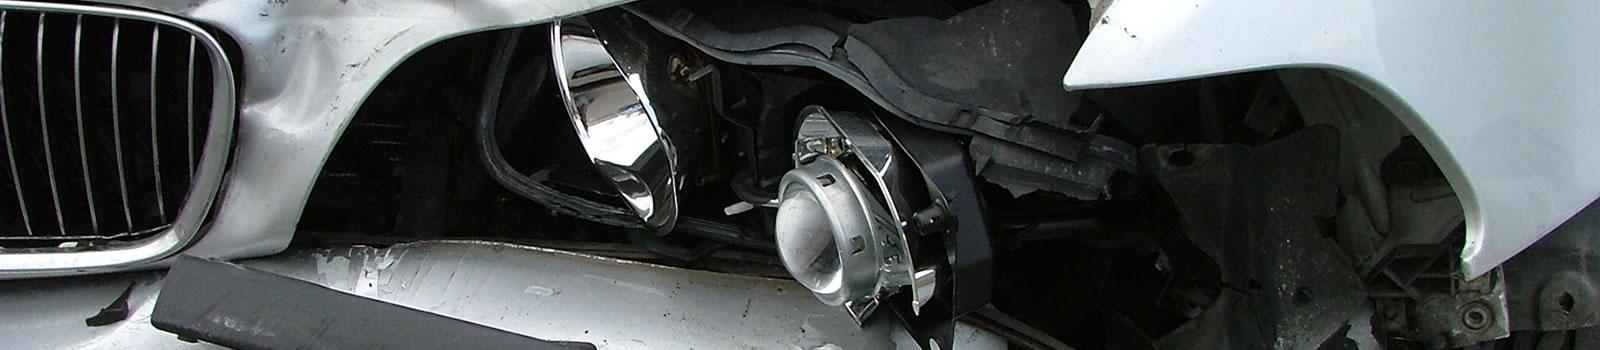 Car Scratch and Dent Repair